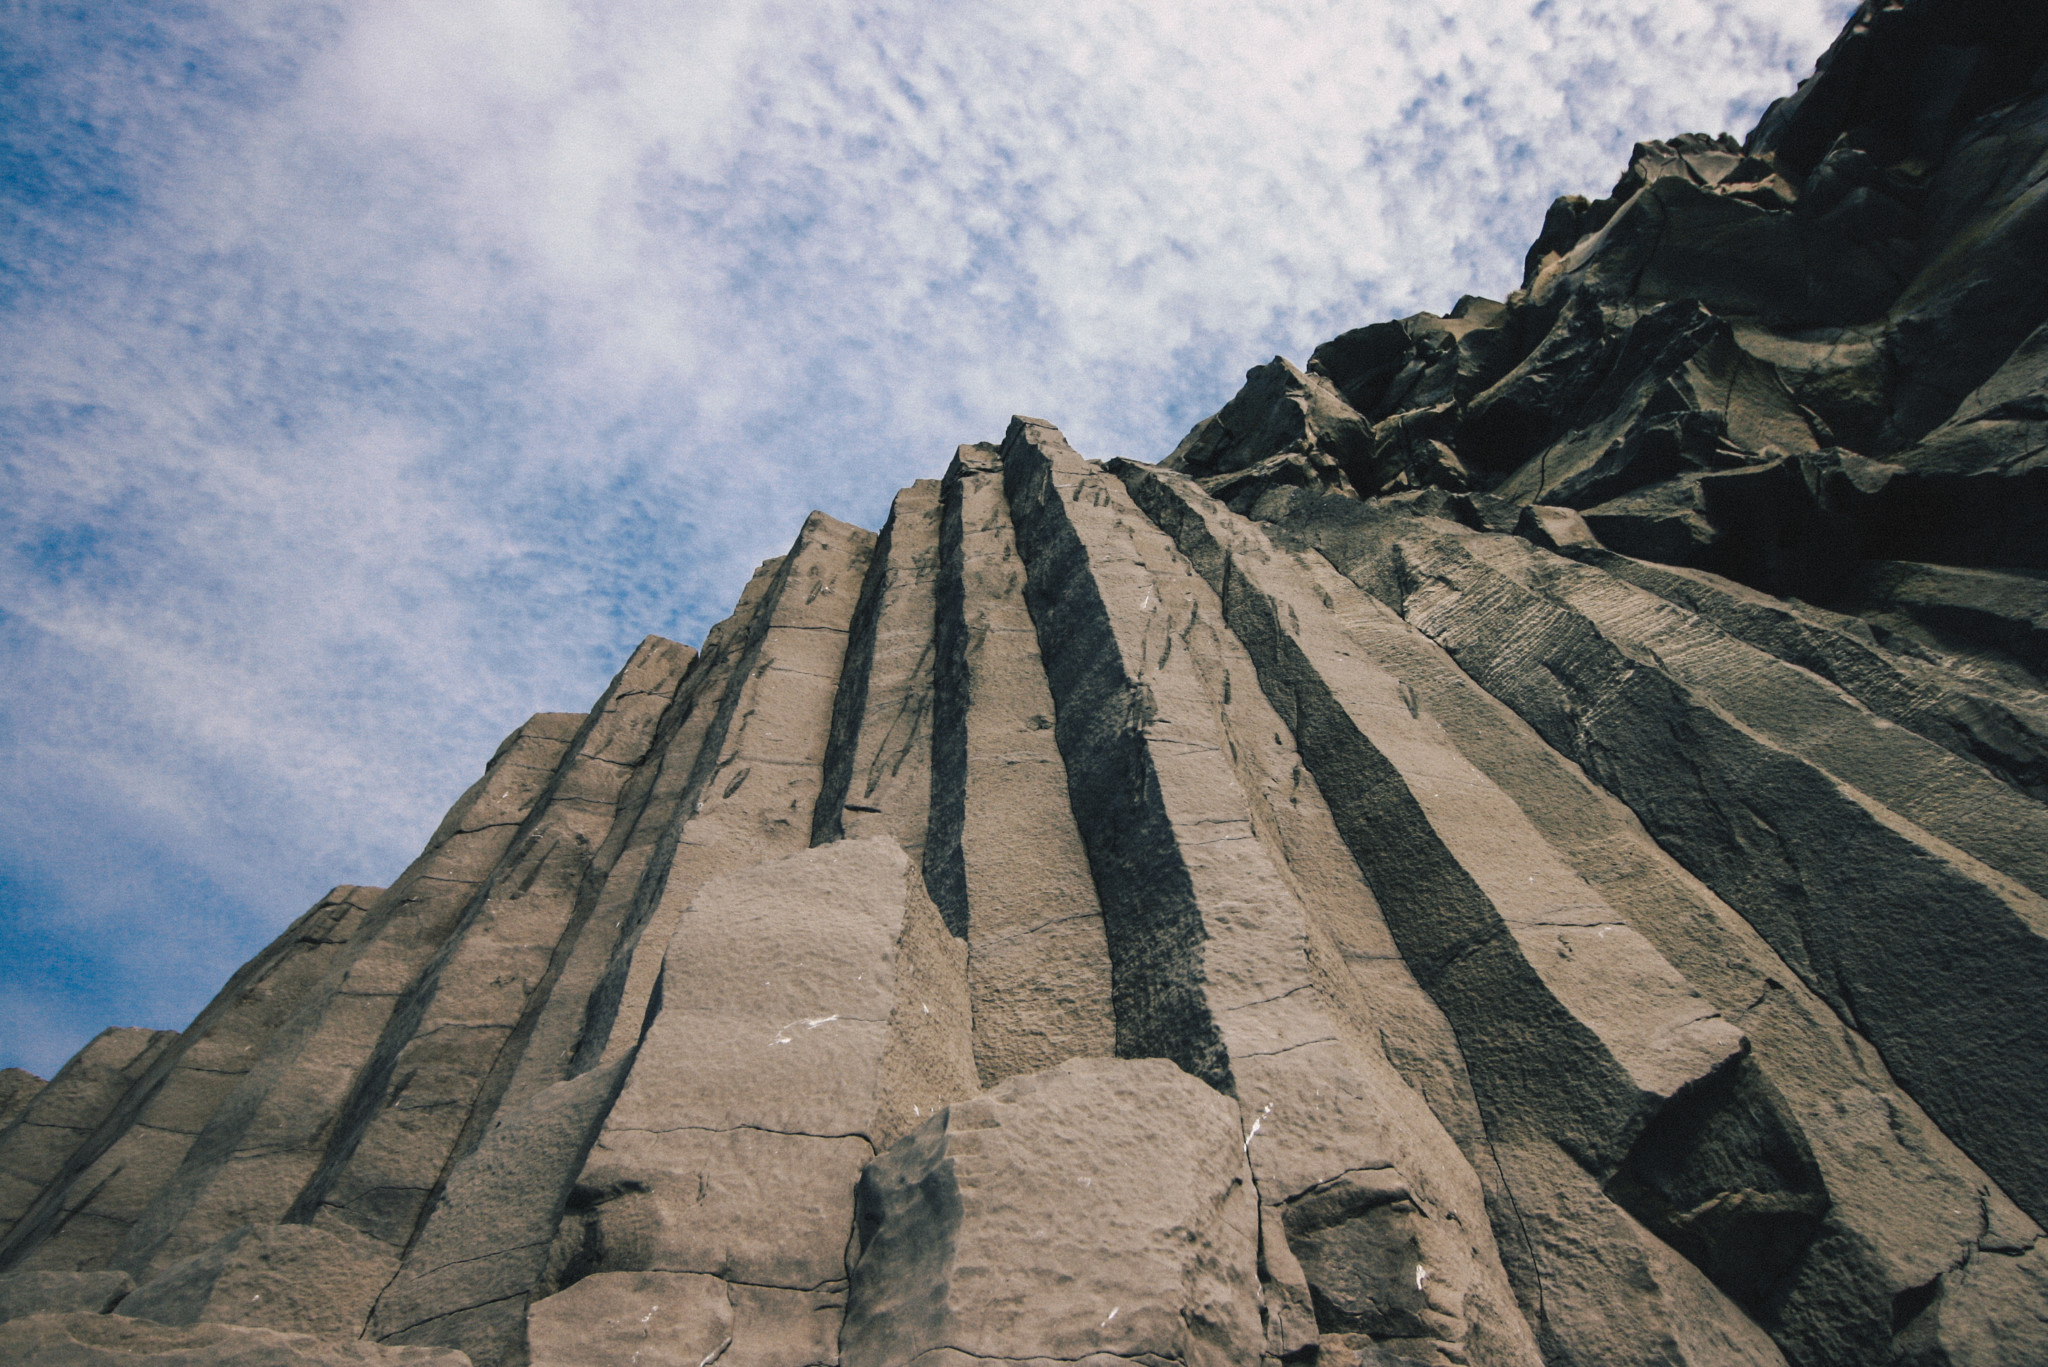 Basalt Columns on Black Sand Beach in Reynisfjara, Iceland